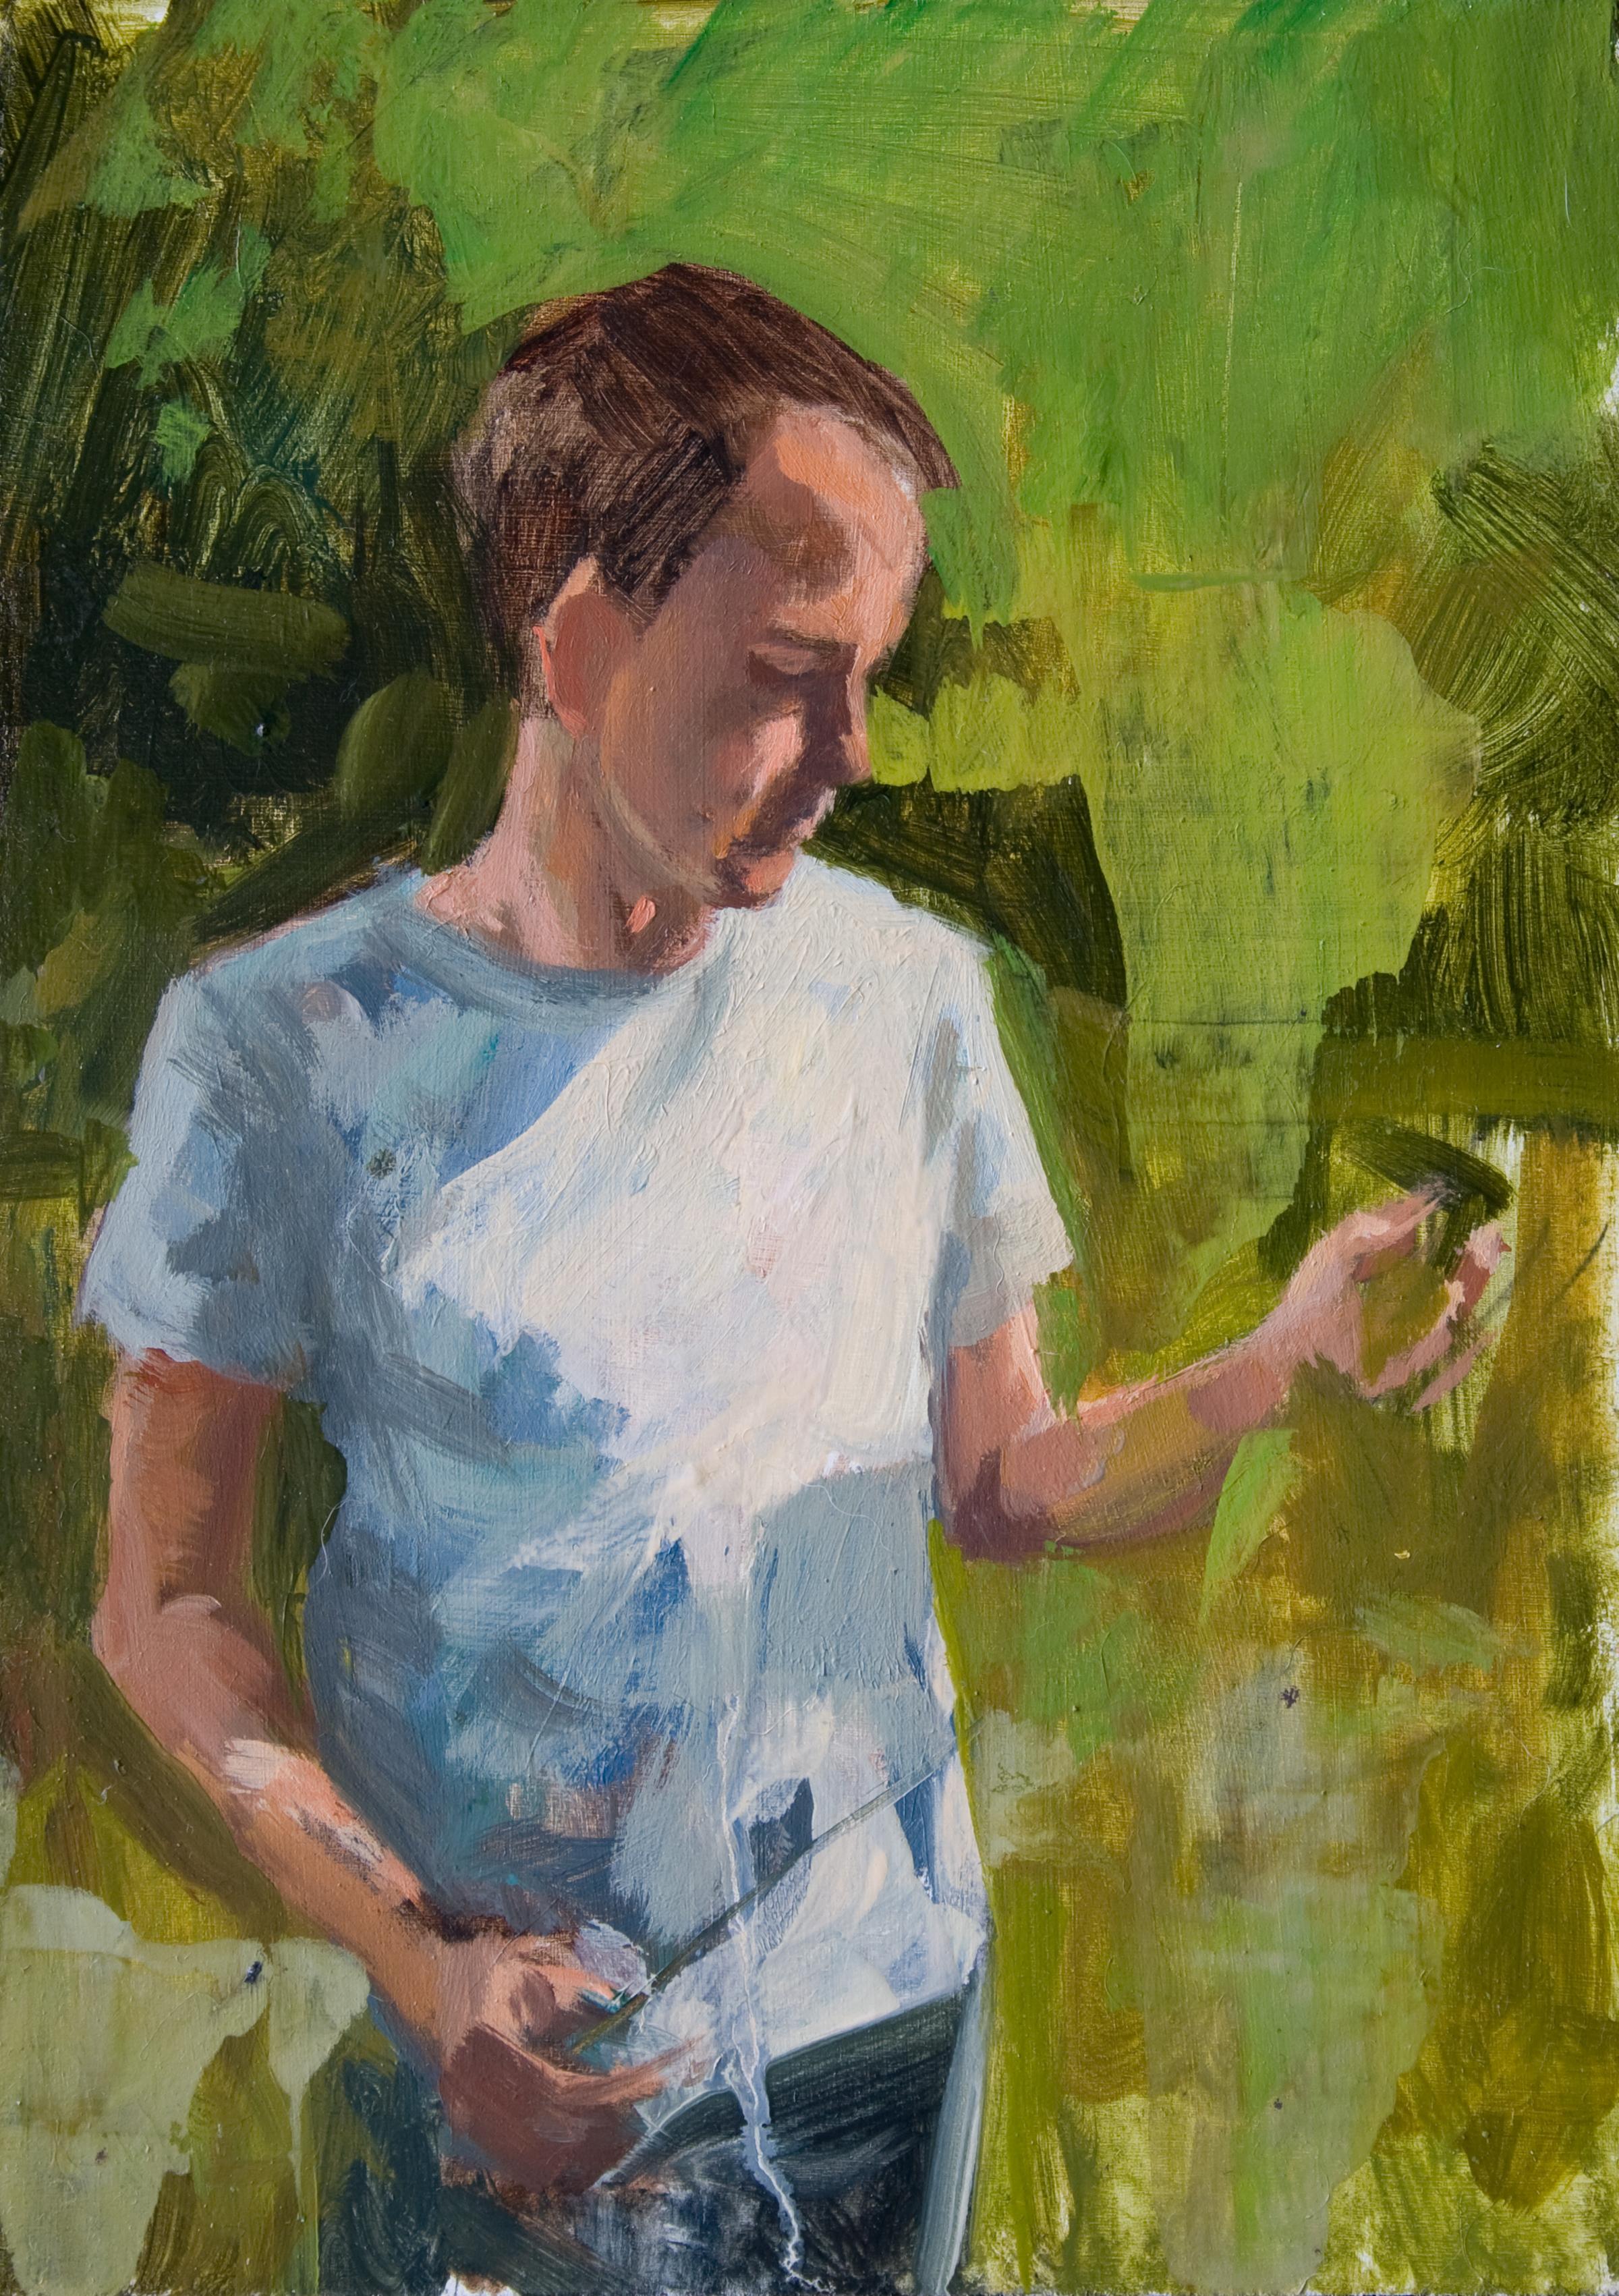 "Vacant Sunlight, 7"" x 5"", oil on panel, 2013"